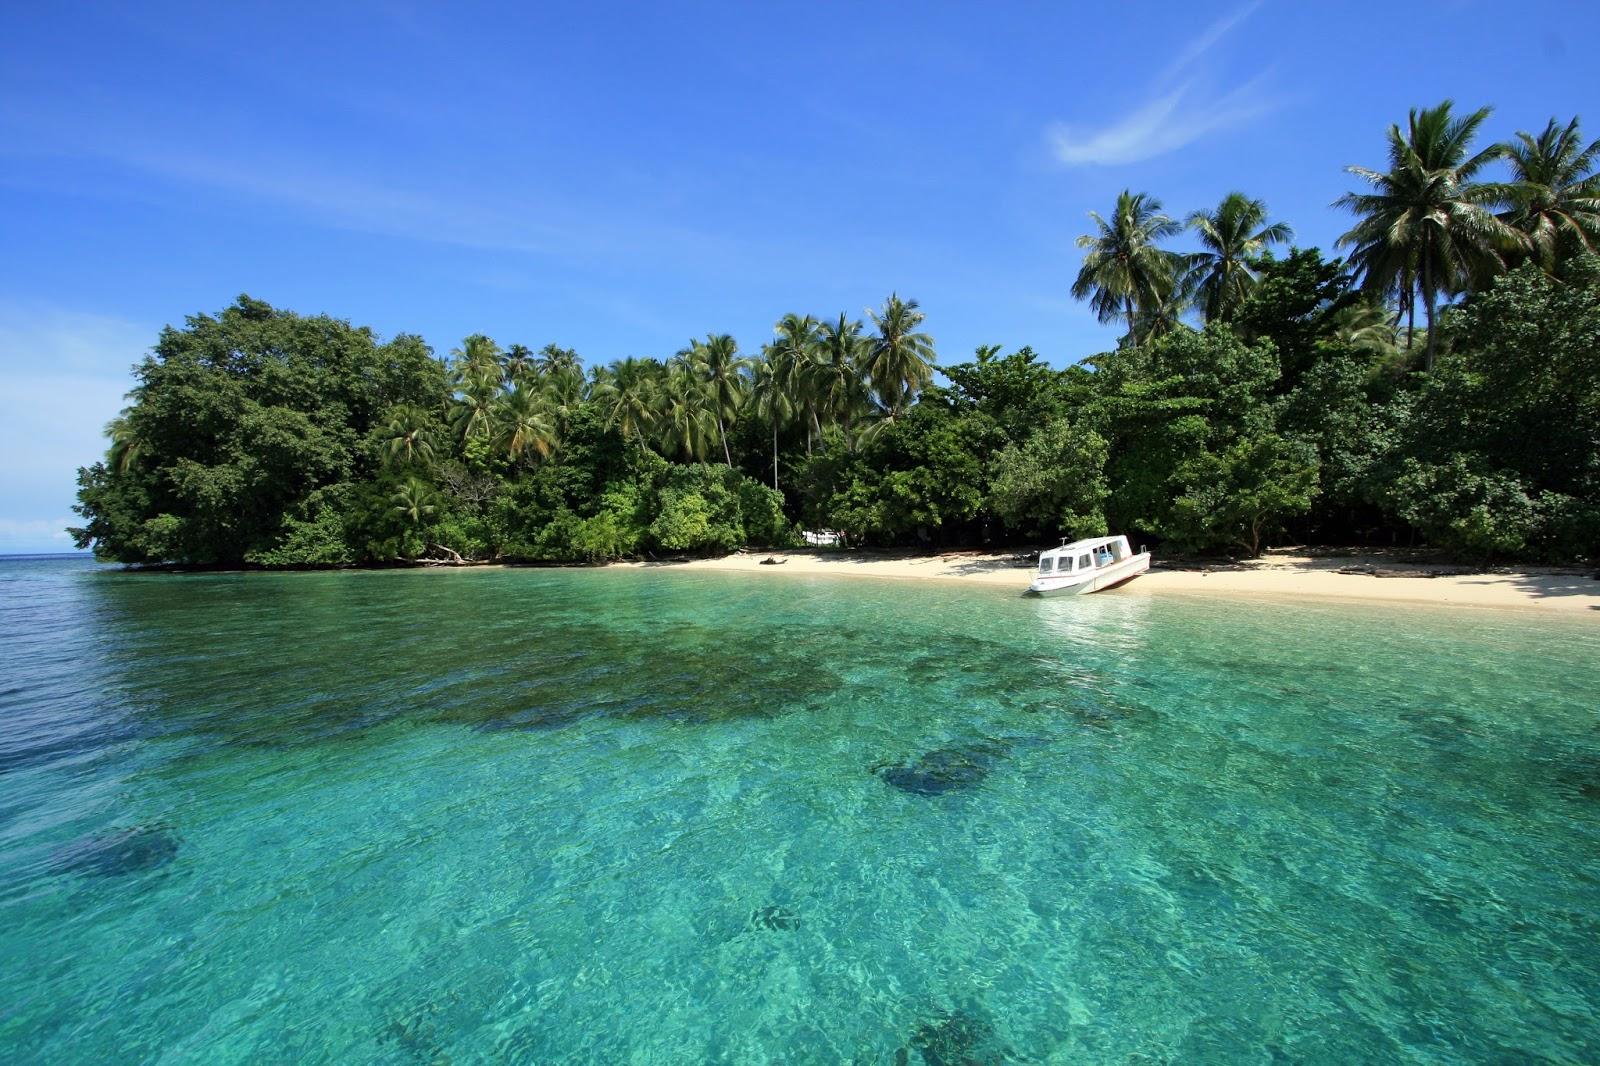 36 Surga Wisata Terbaik Papua Tersembunyi Taman Nasional Teluk Cendrawasih